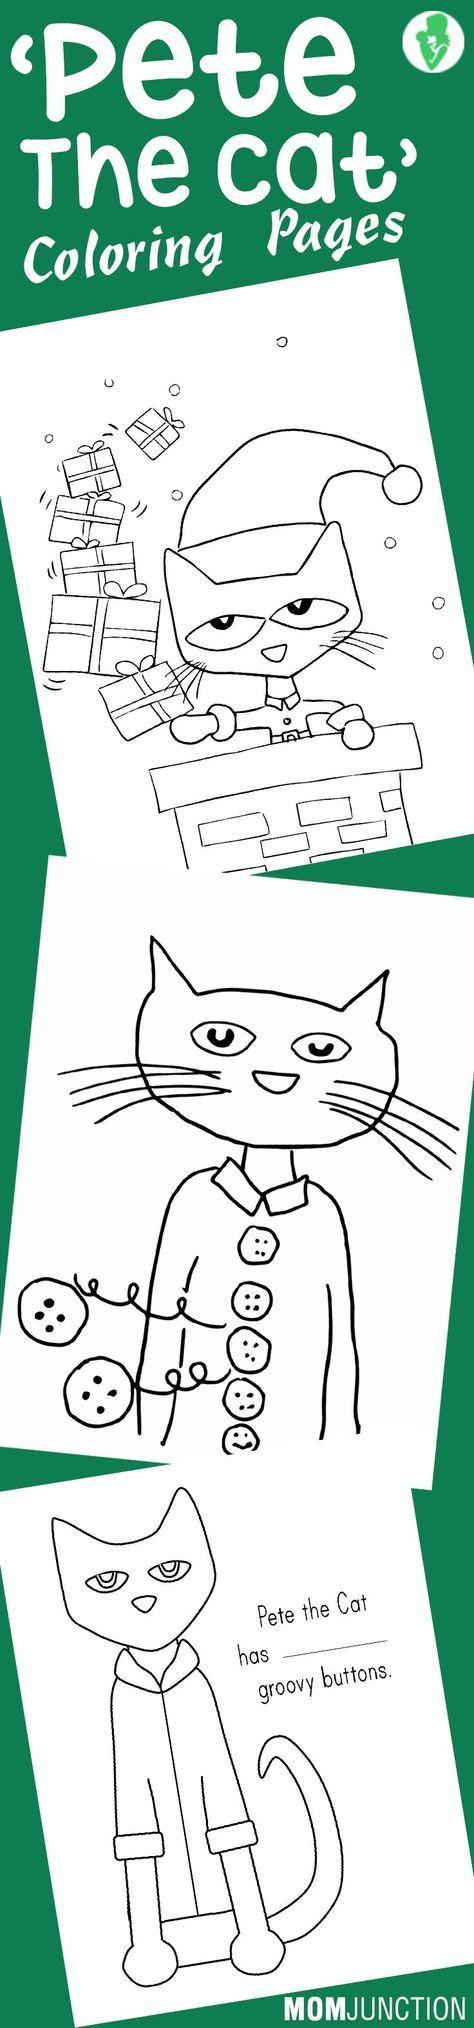 952cdde5c8044ec0f47dca47631ad8e9--book-activities-pete-the-cat-activities